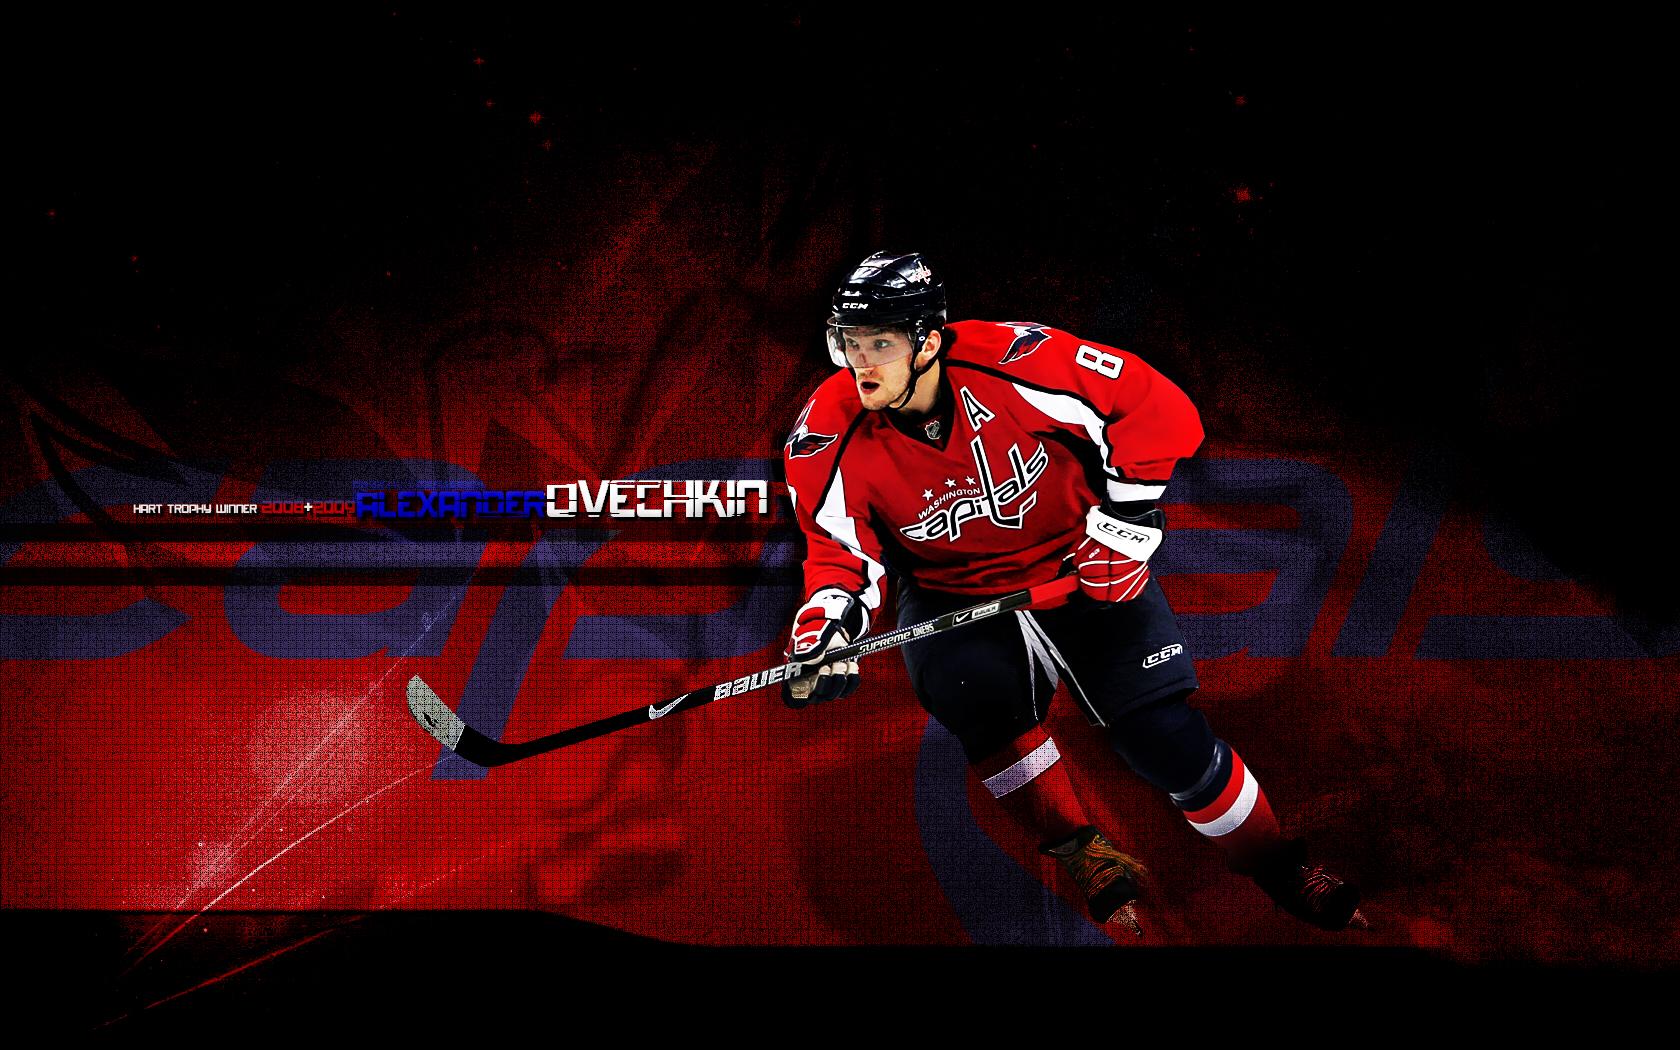 NHL Washington Capitals Ovechkin wallpaper 2018 in Hockey 1680x1050